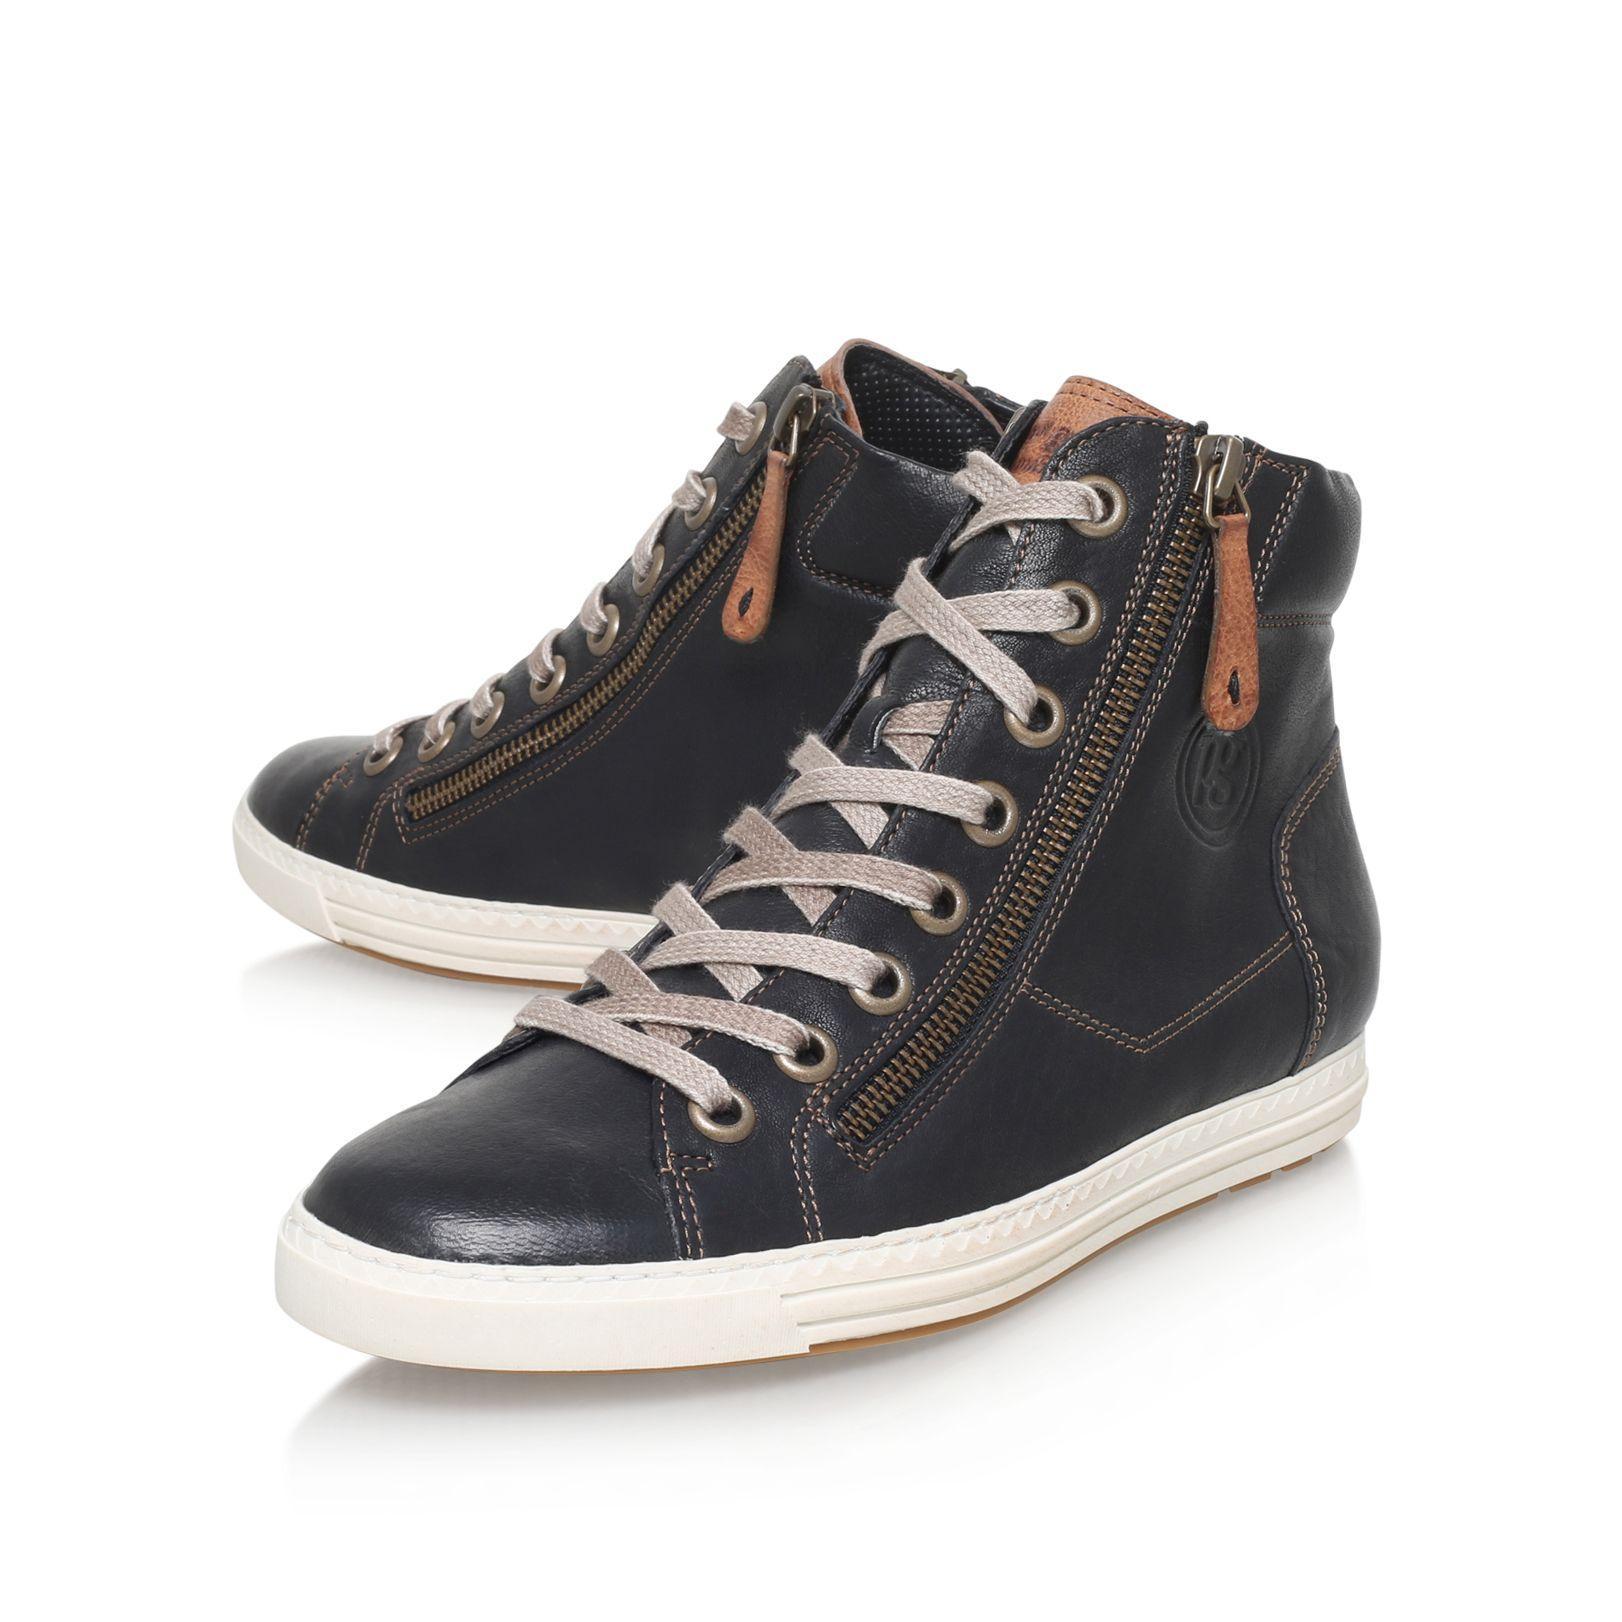 Paul Green Shoes Australia